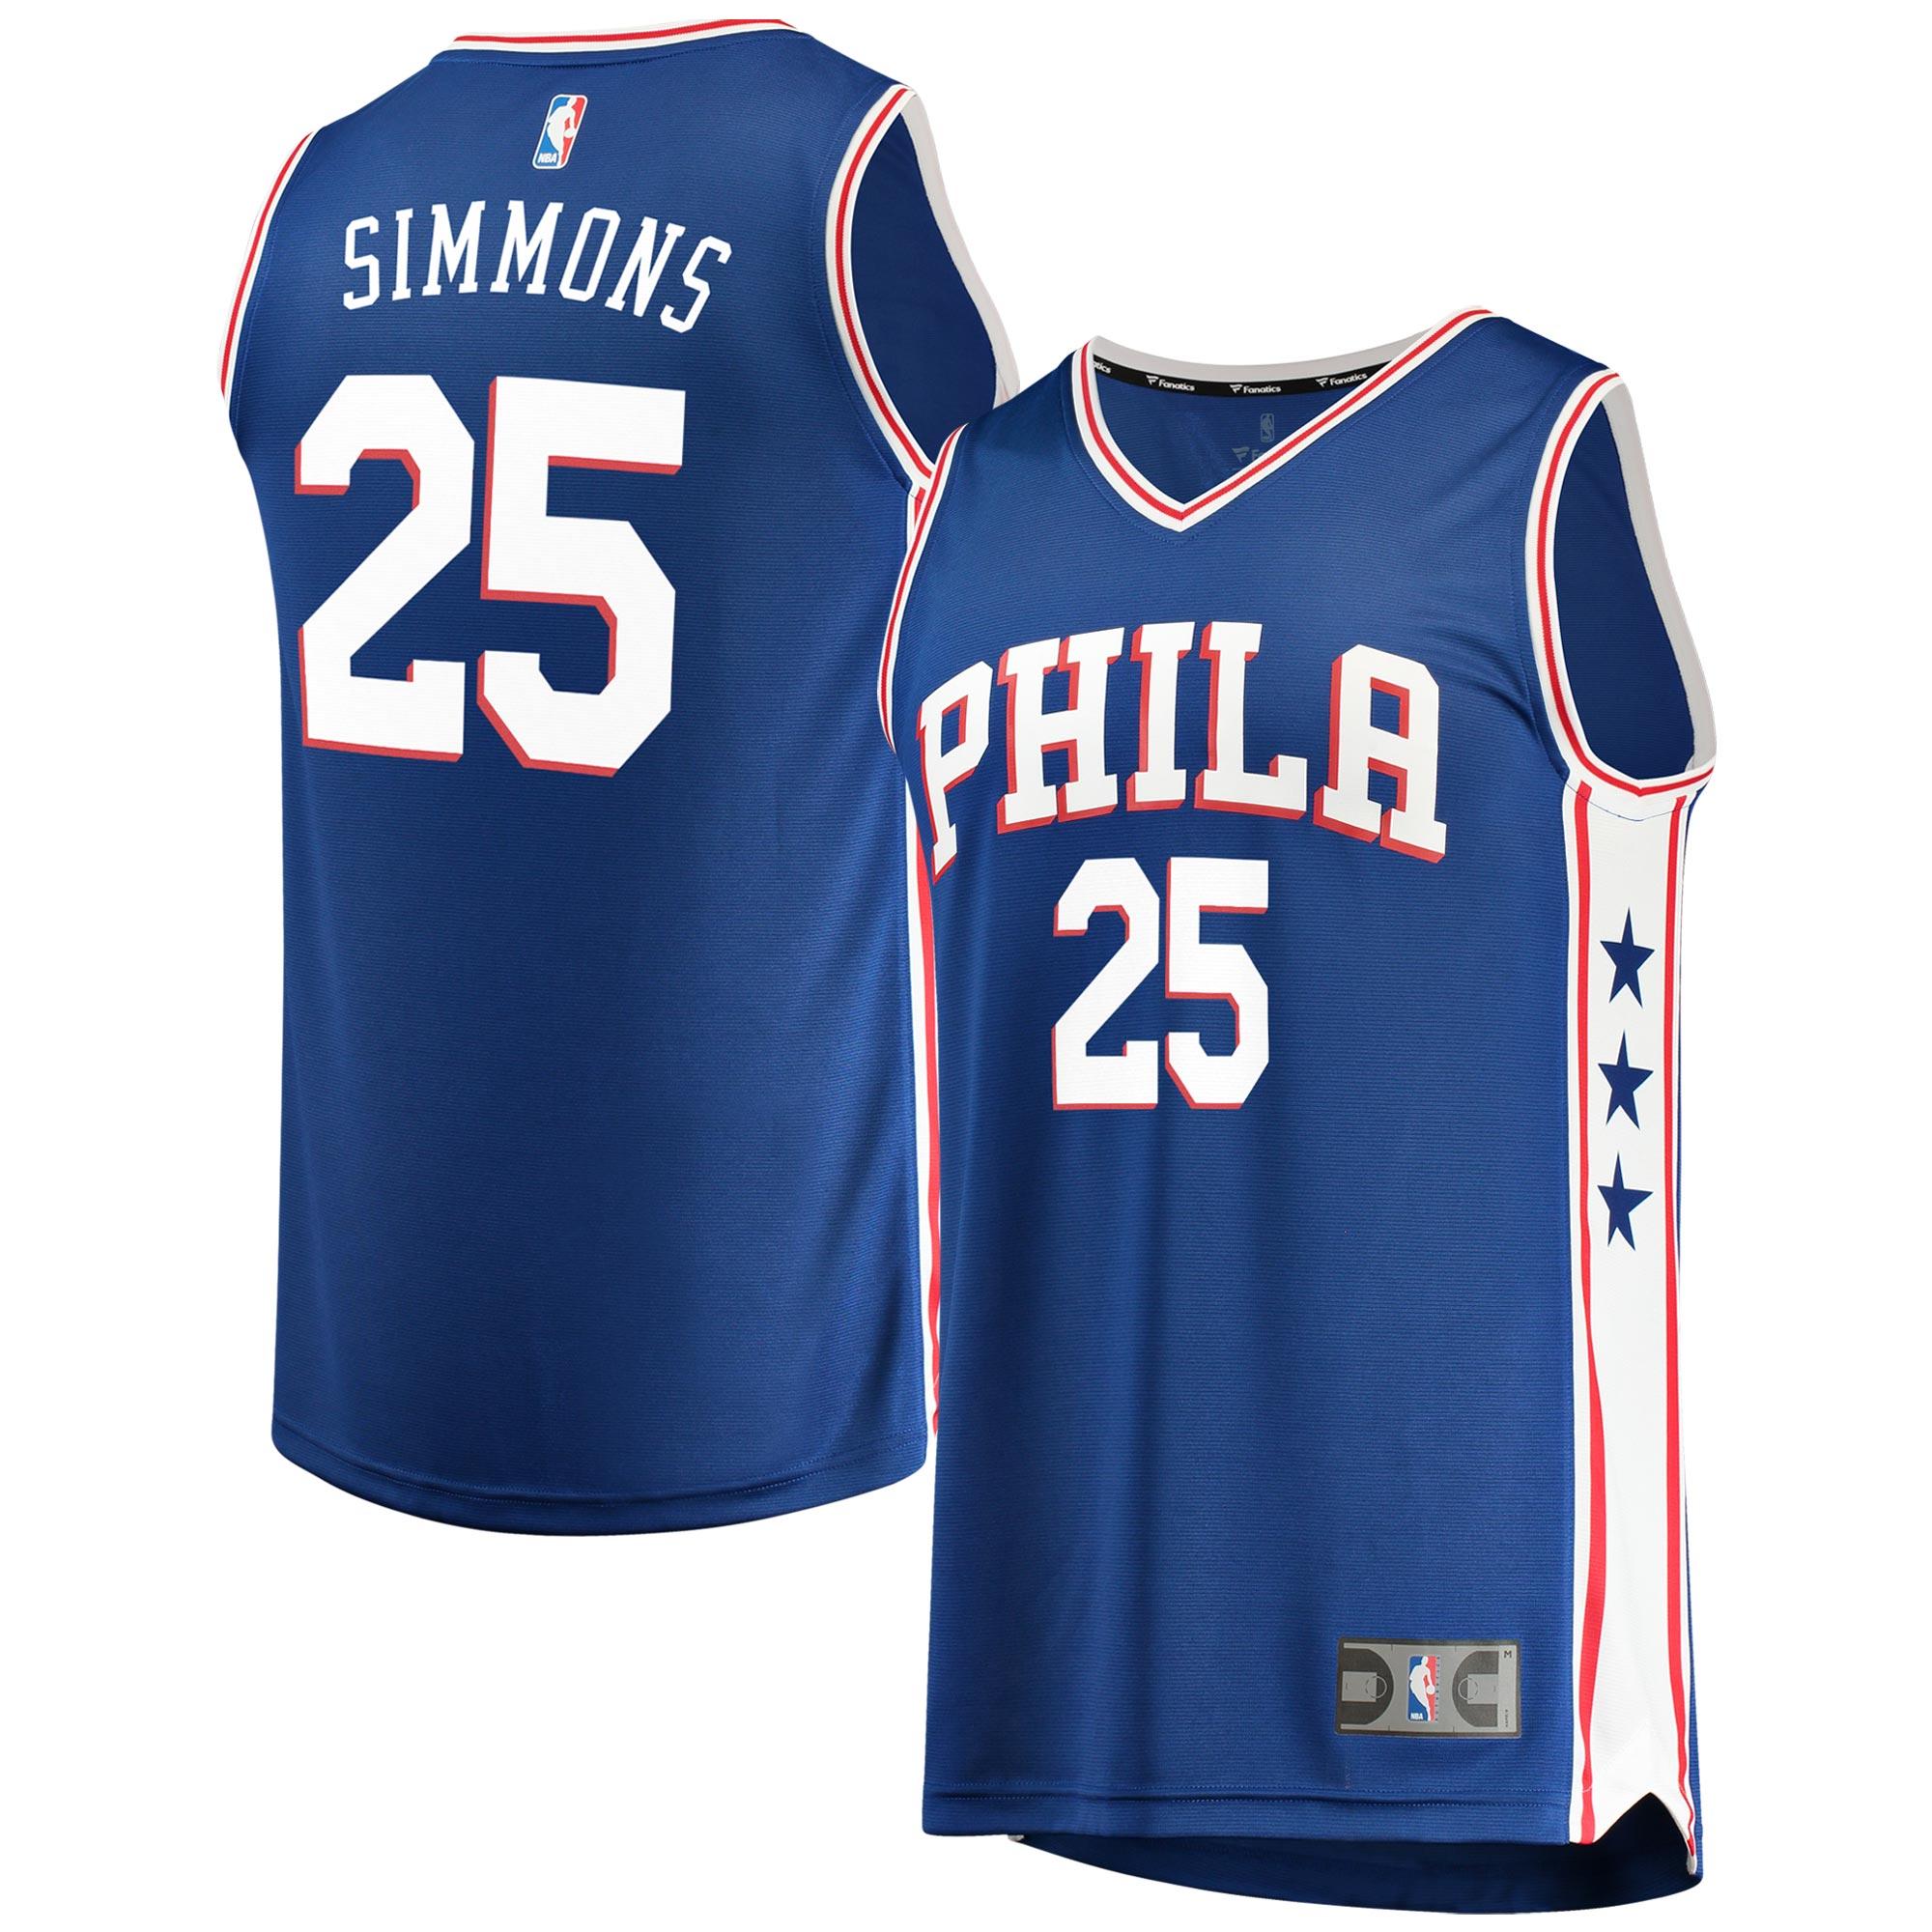 Ben Simmons Philadelphia 76ers Fanatics Branded Youth Fast Break Replica Jersey Royal - Icon Edition